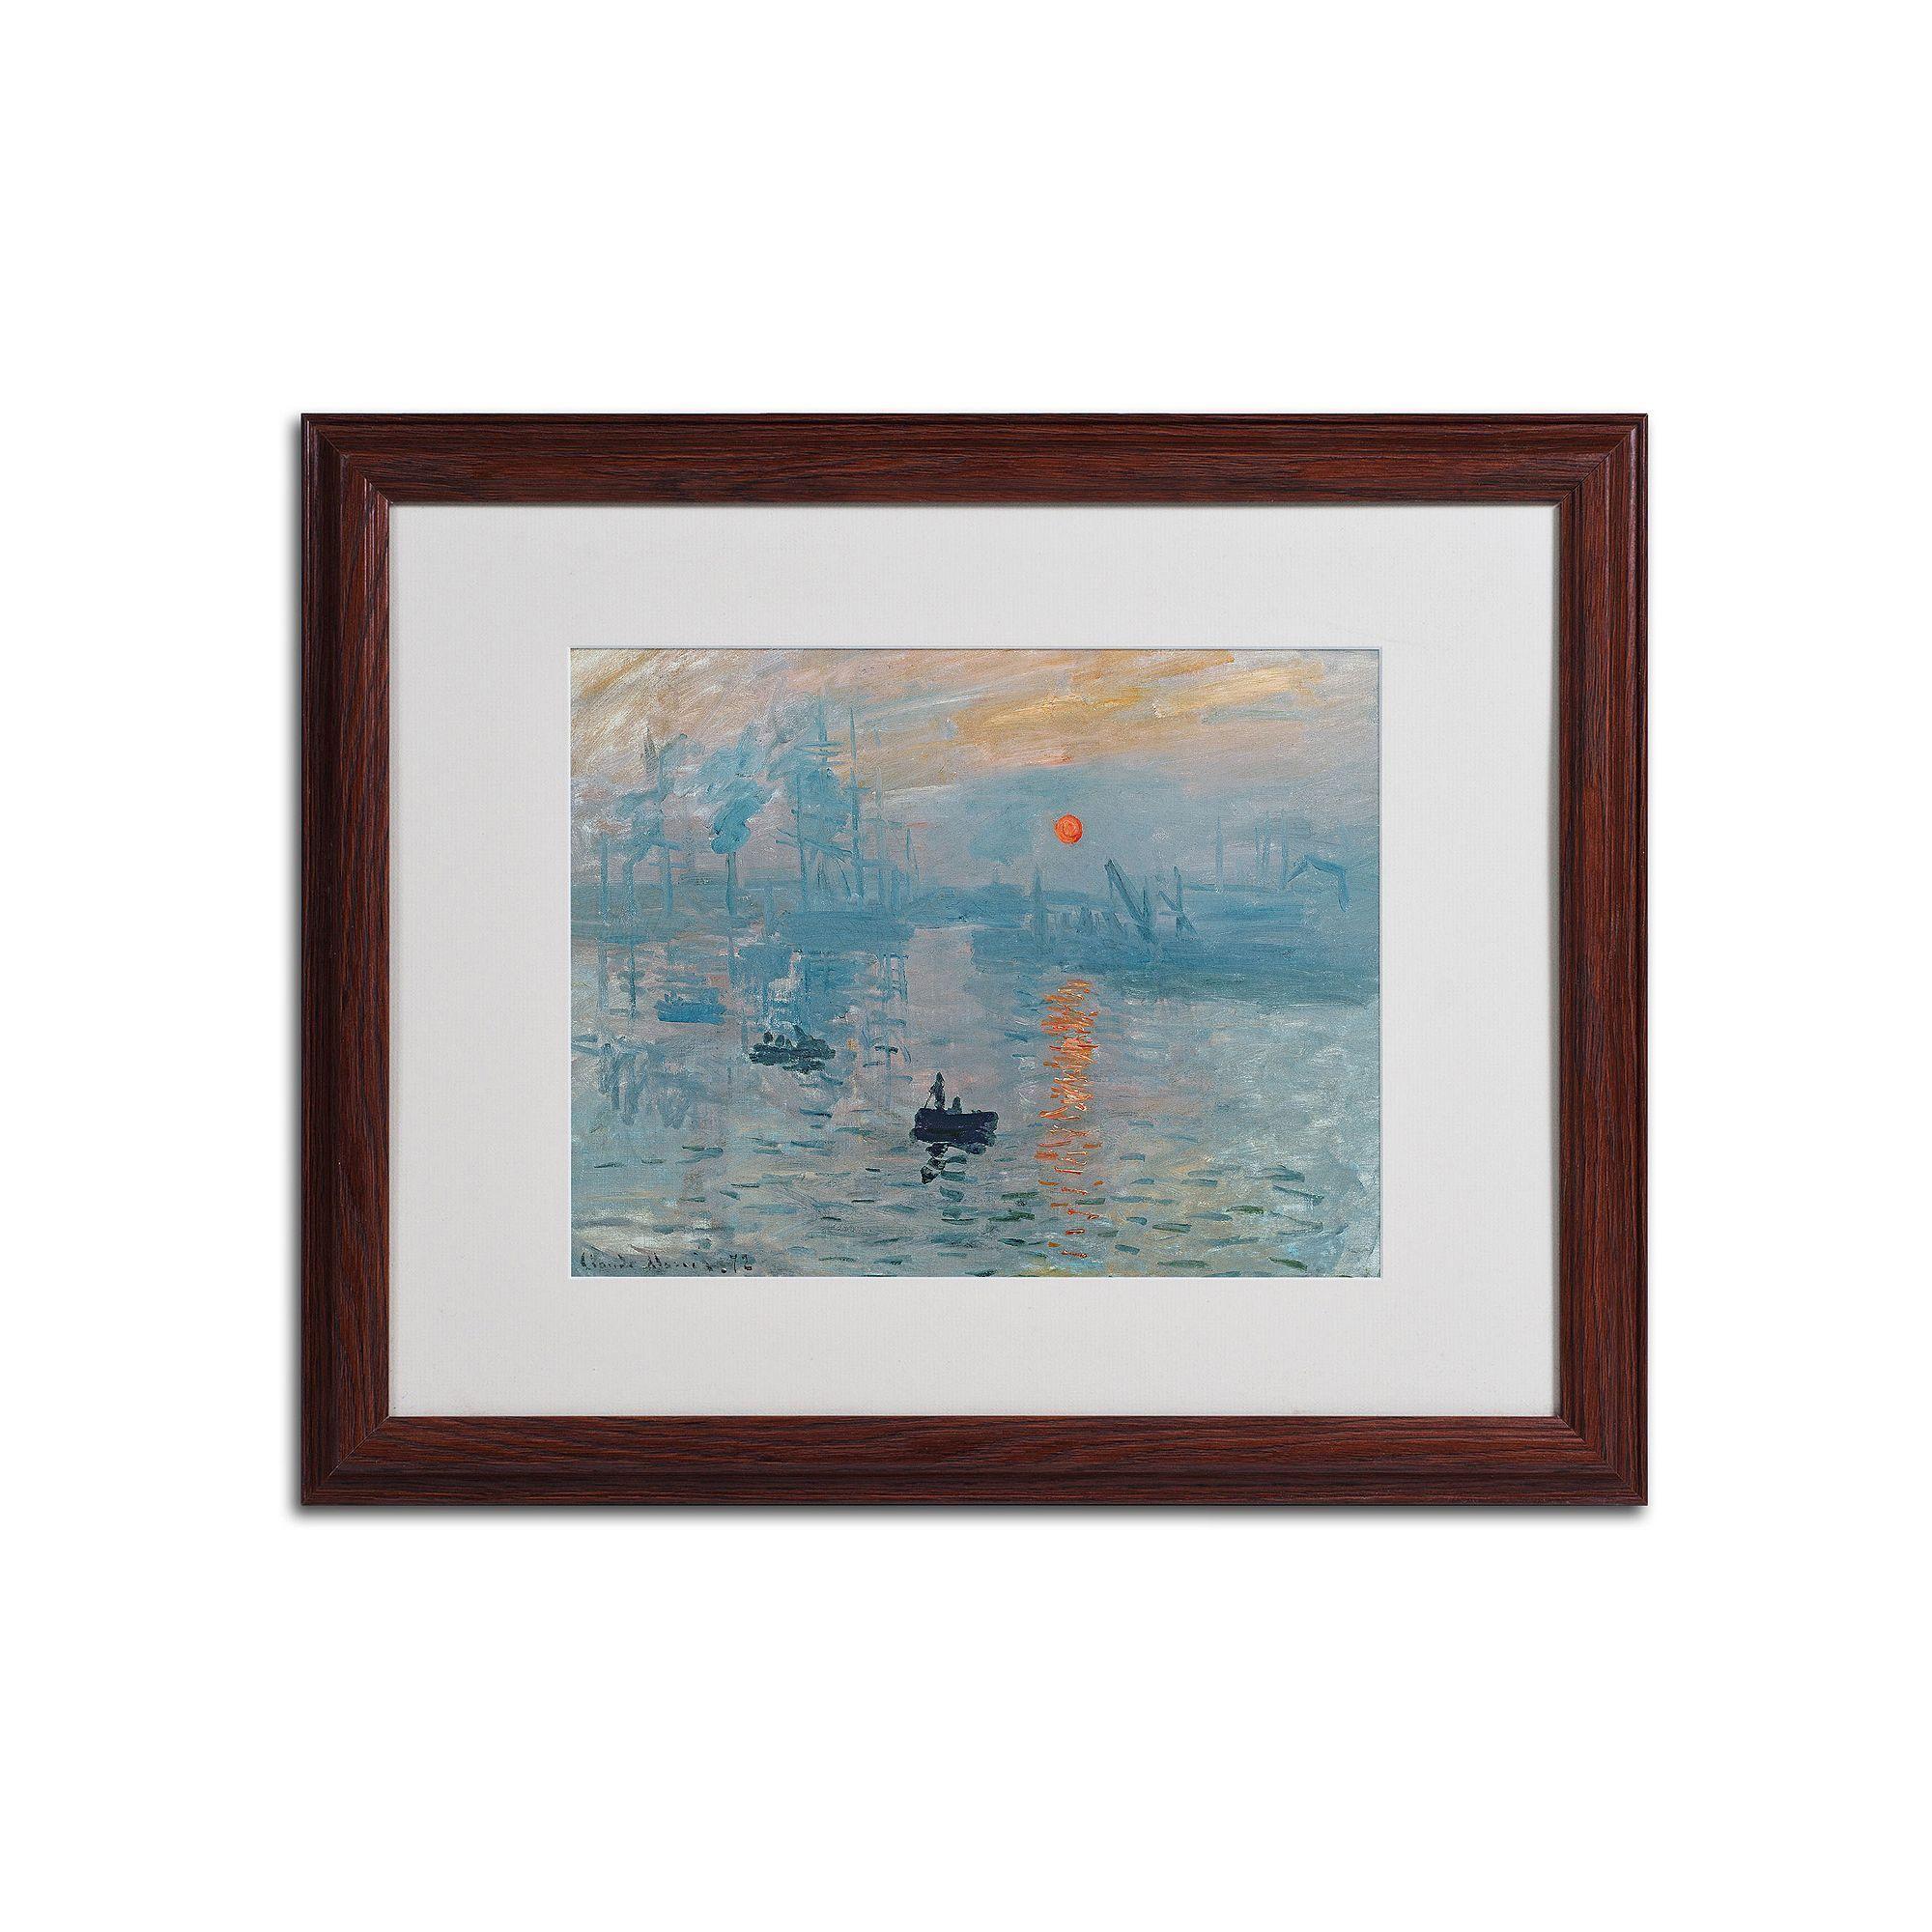 Trademark Fine Art Impression Sunrise Framed Canvas Wall Art By